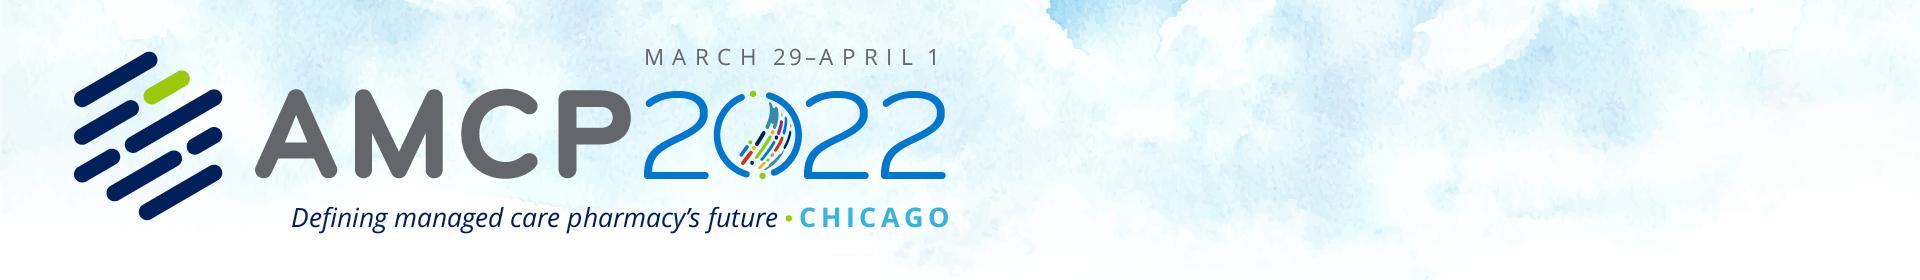 AMCP 2022  Event Banner